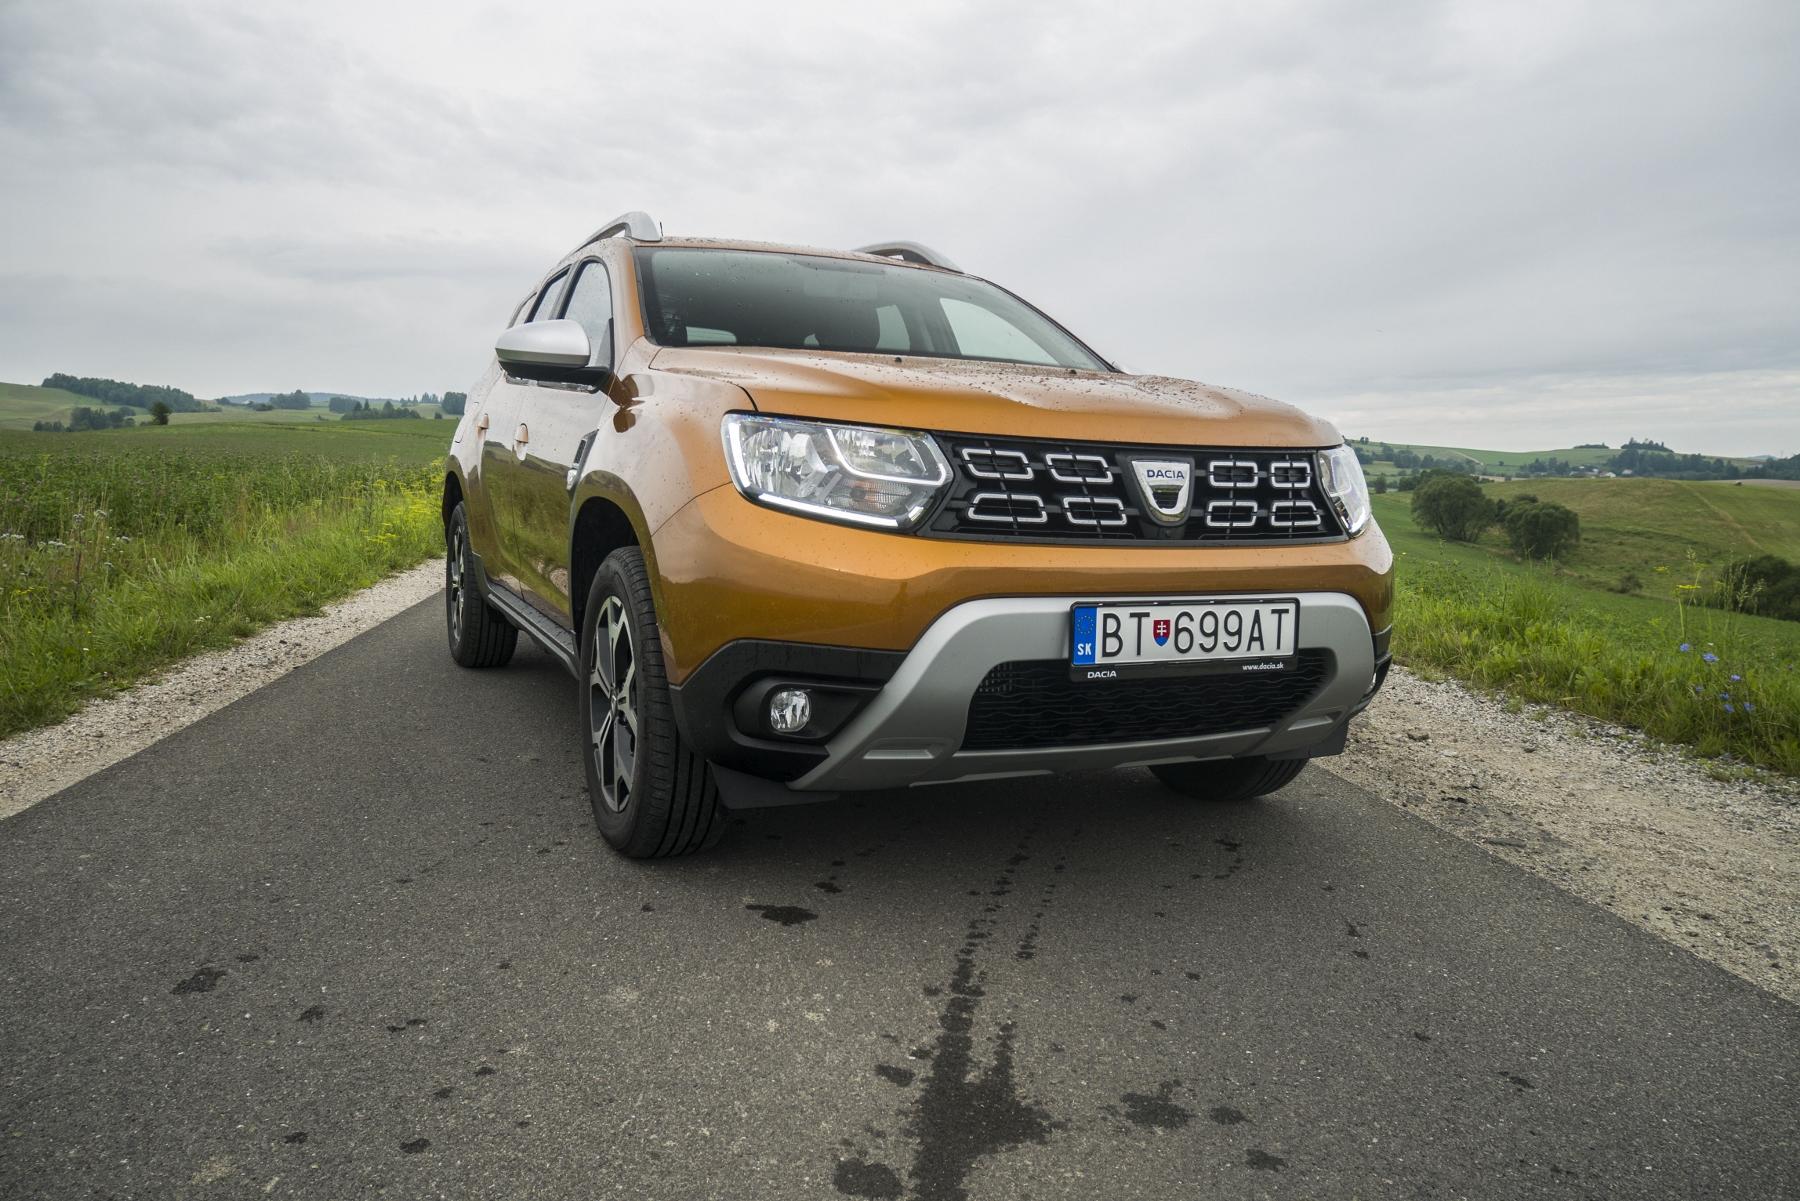 Test: Dacia Duster LPG je voľbou rozumu sokRR5LsE7 dacia-duster-lpg-2